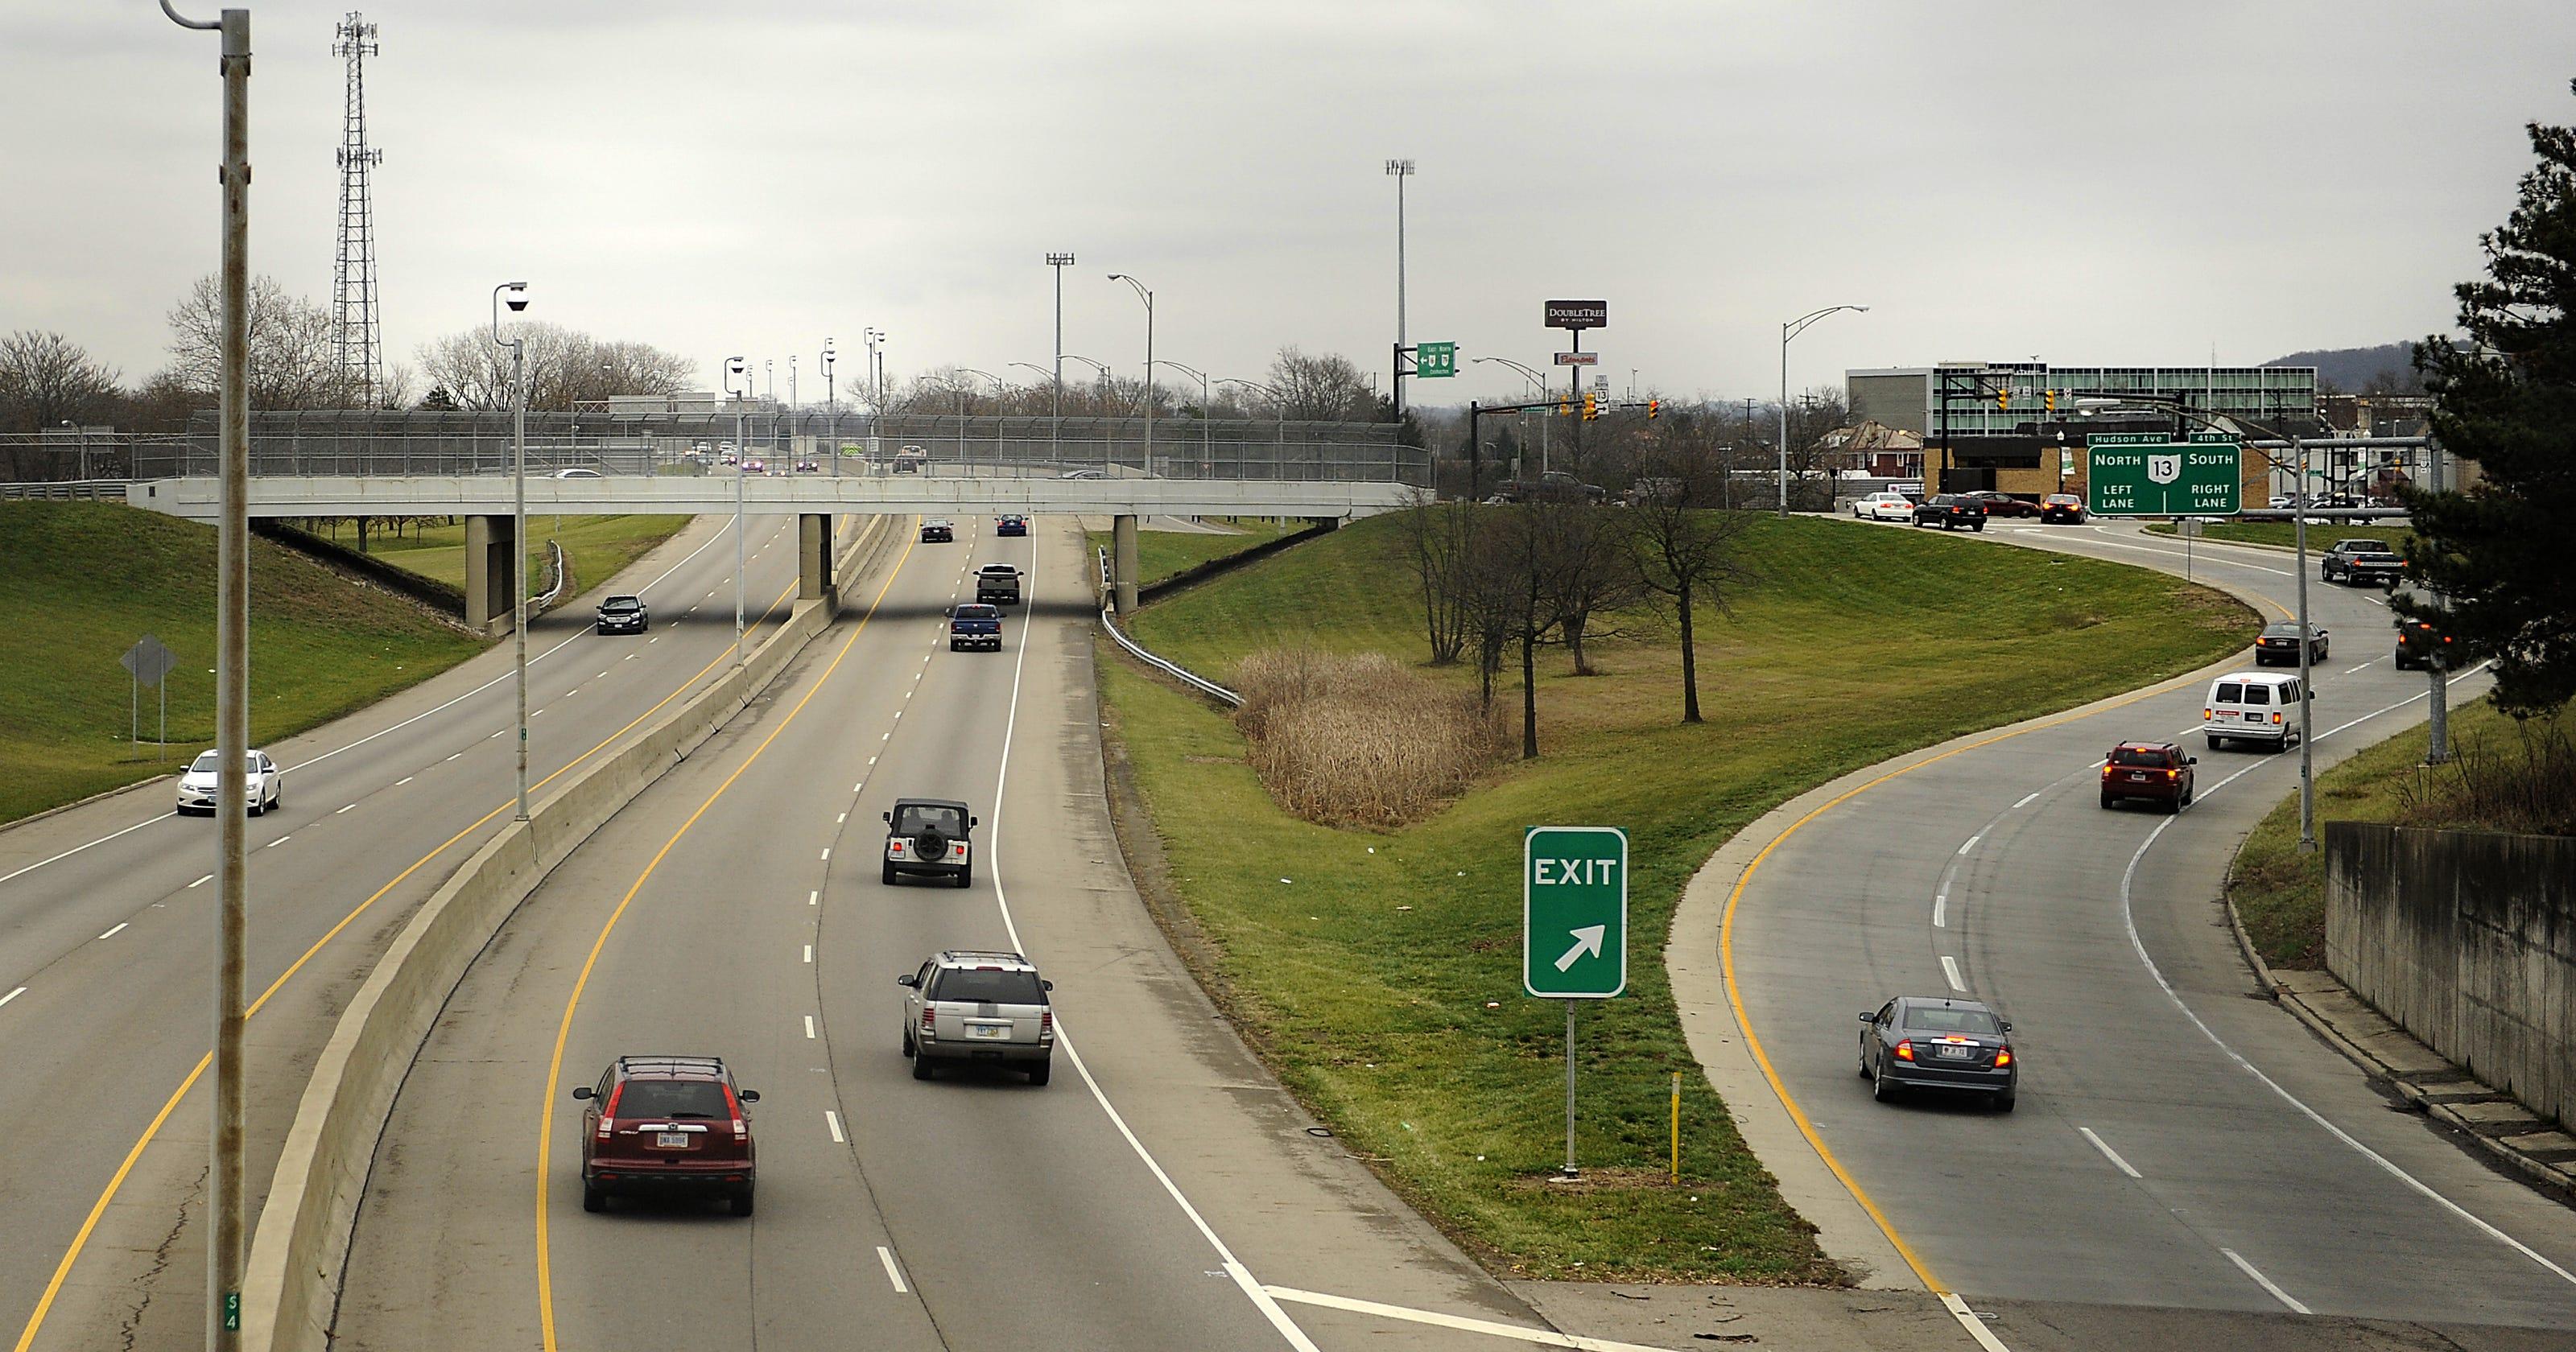 Mount Vernon Road bridge widening delayed until 2017